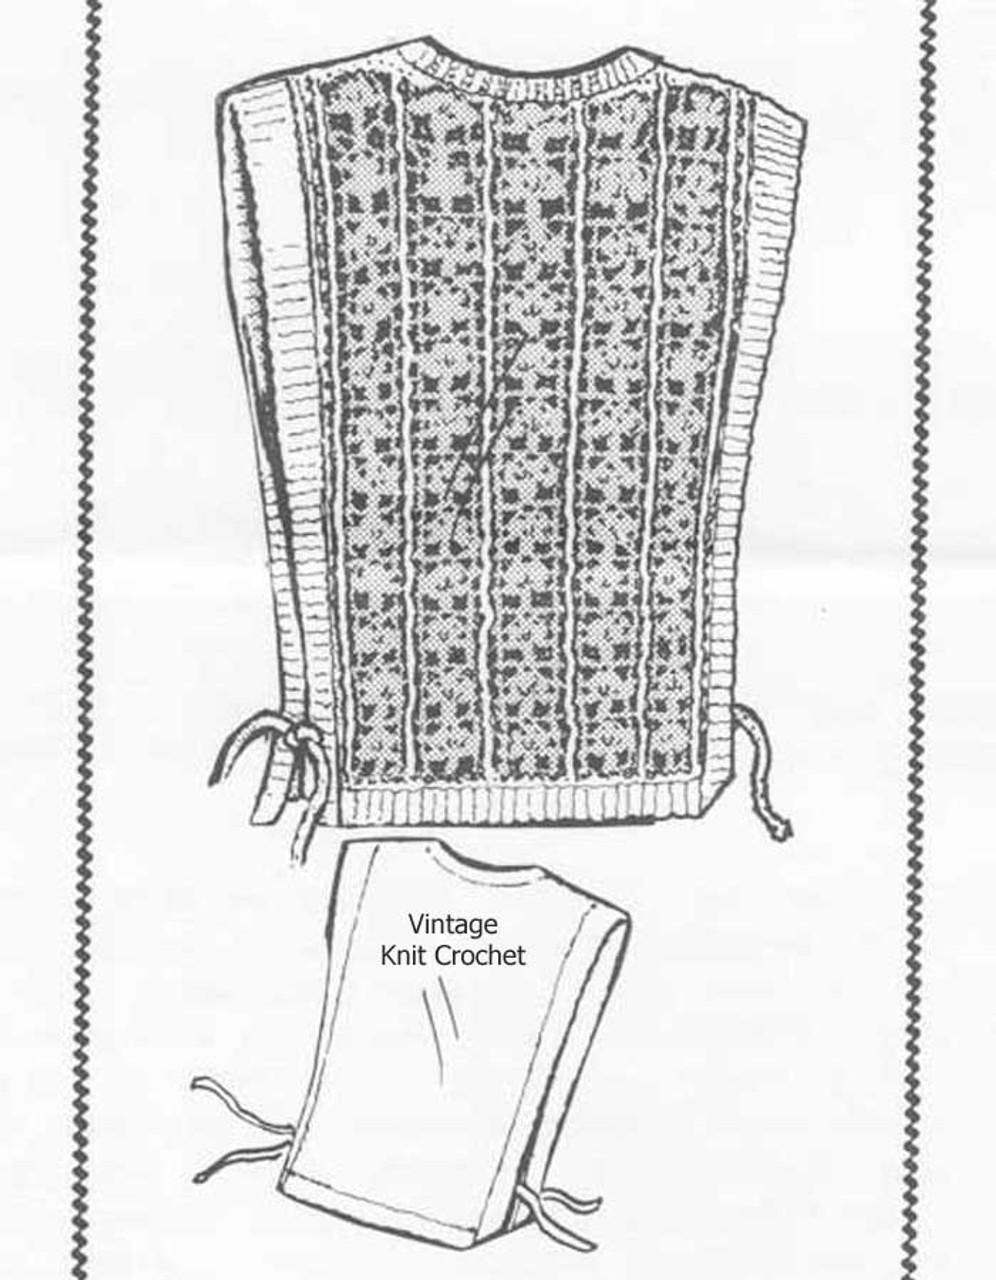 Lacy Crochet popover pattern, Laura Wheeler 678